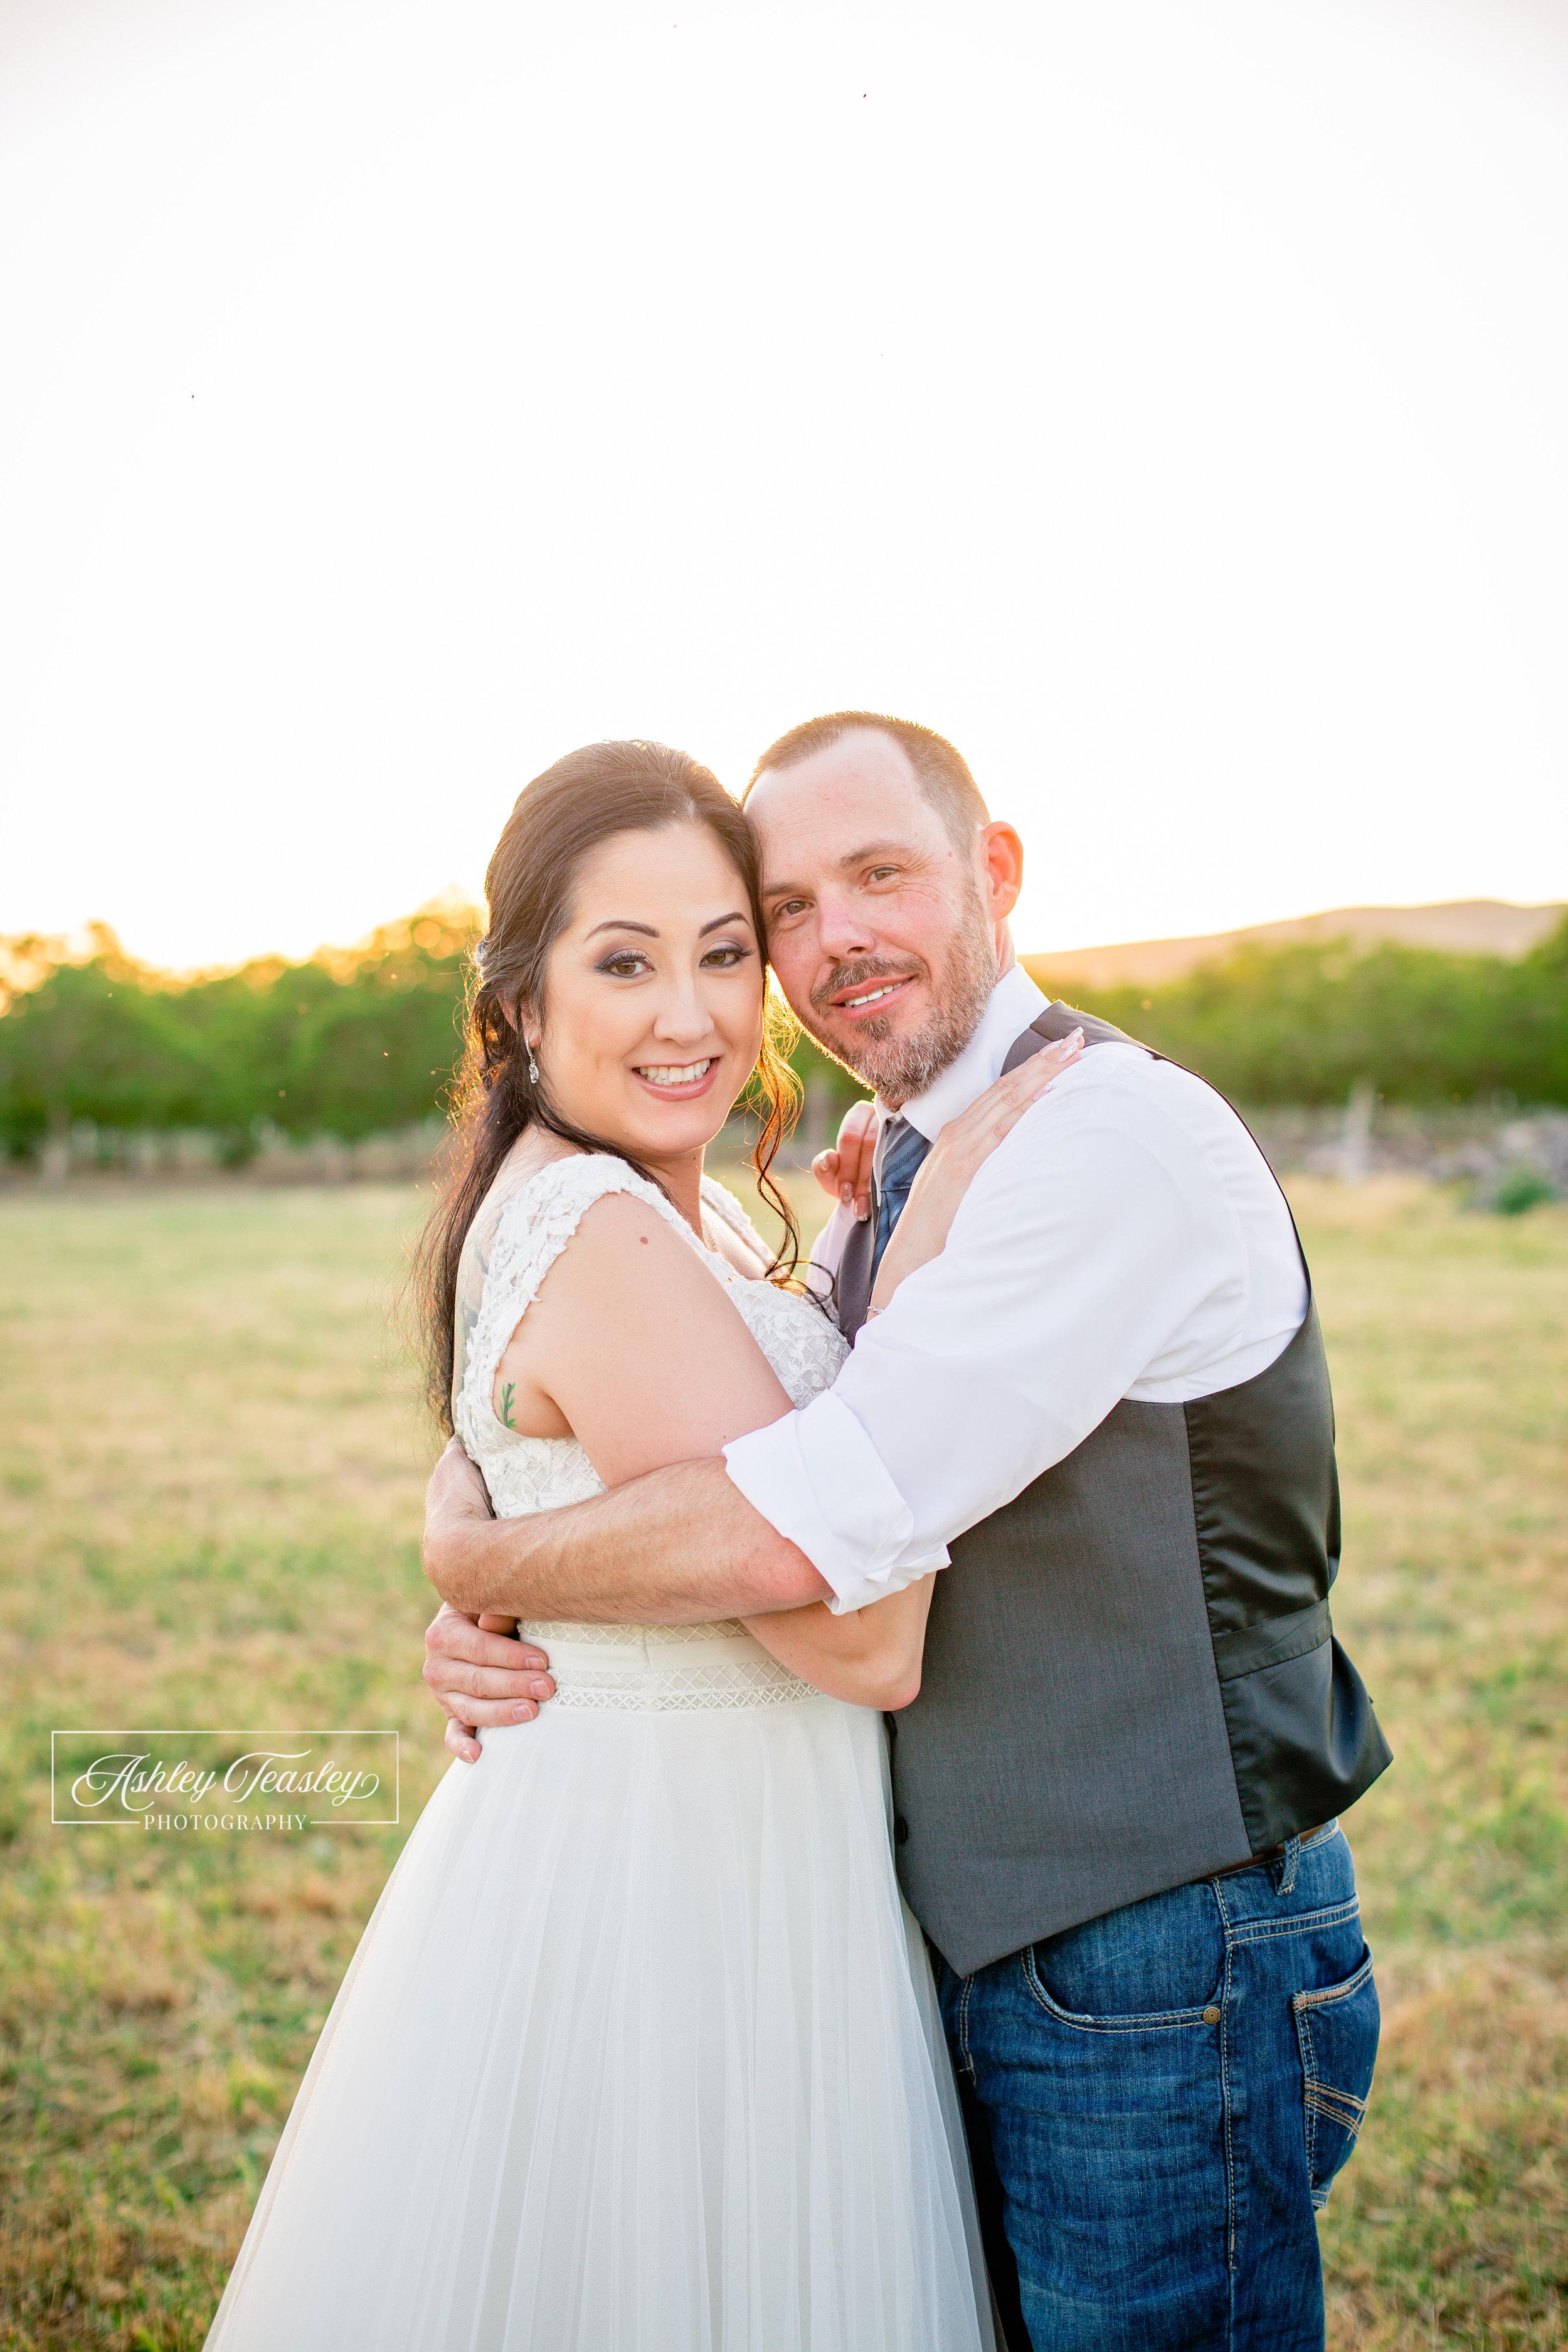 Jeanette & Rance - Butte Star Ranch - Sacramento Wedding Photographer - Ashley Teasley Photography (9 of 41).jpg